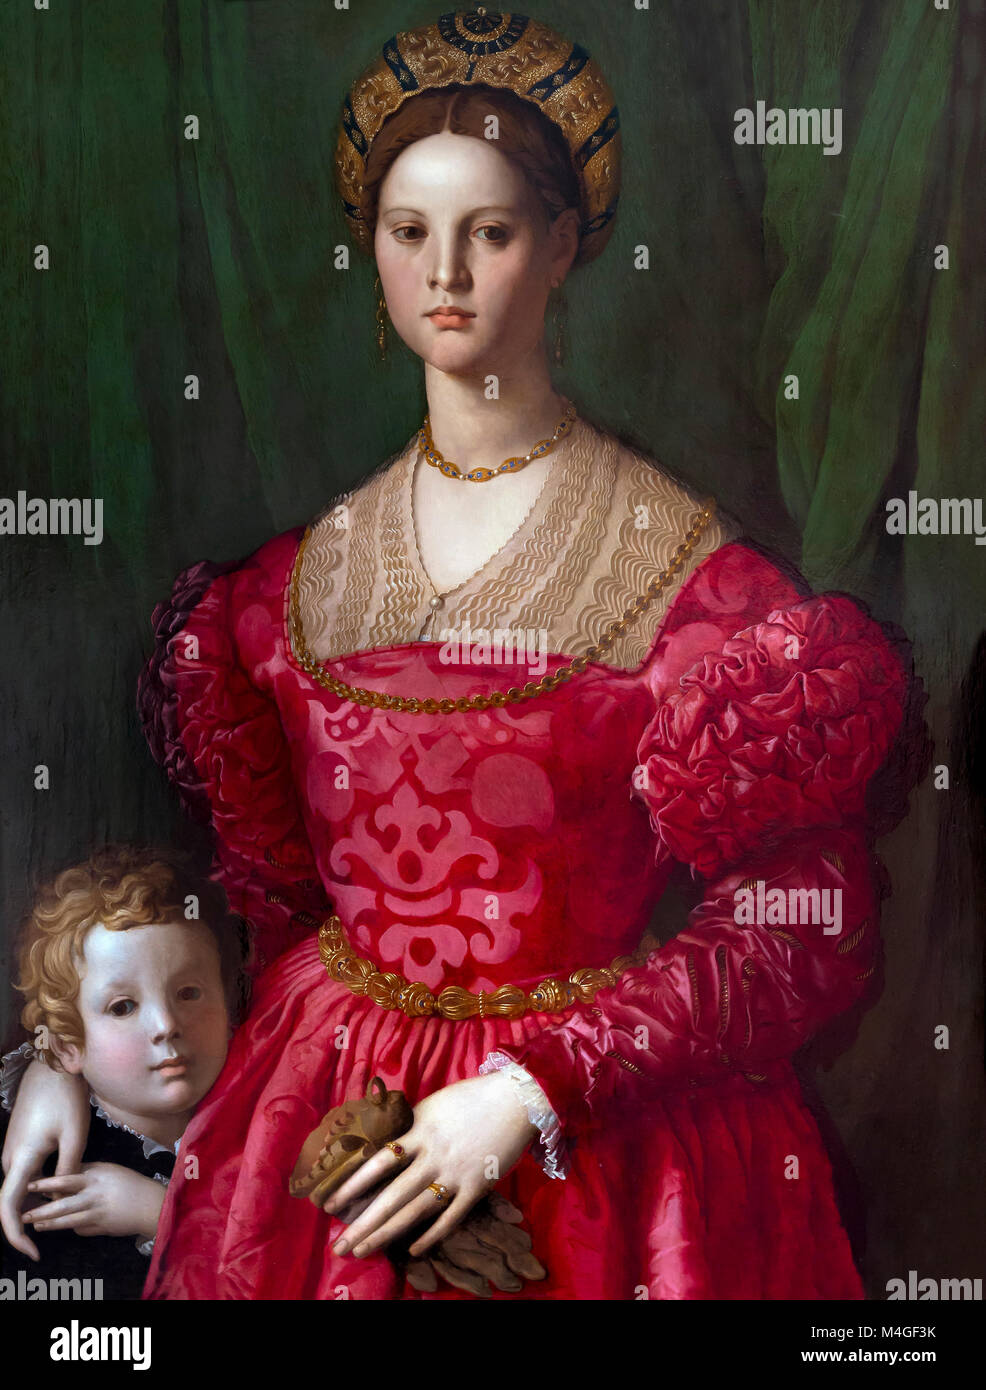 A Young Woman and Her Little Boy, Agnolo Bronzino, circa 1540, National Gallery of Art, Washington DC, USA, North - Stock Image